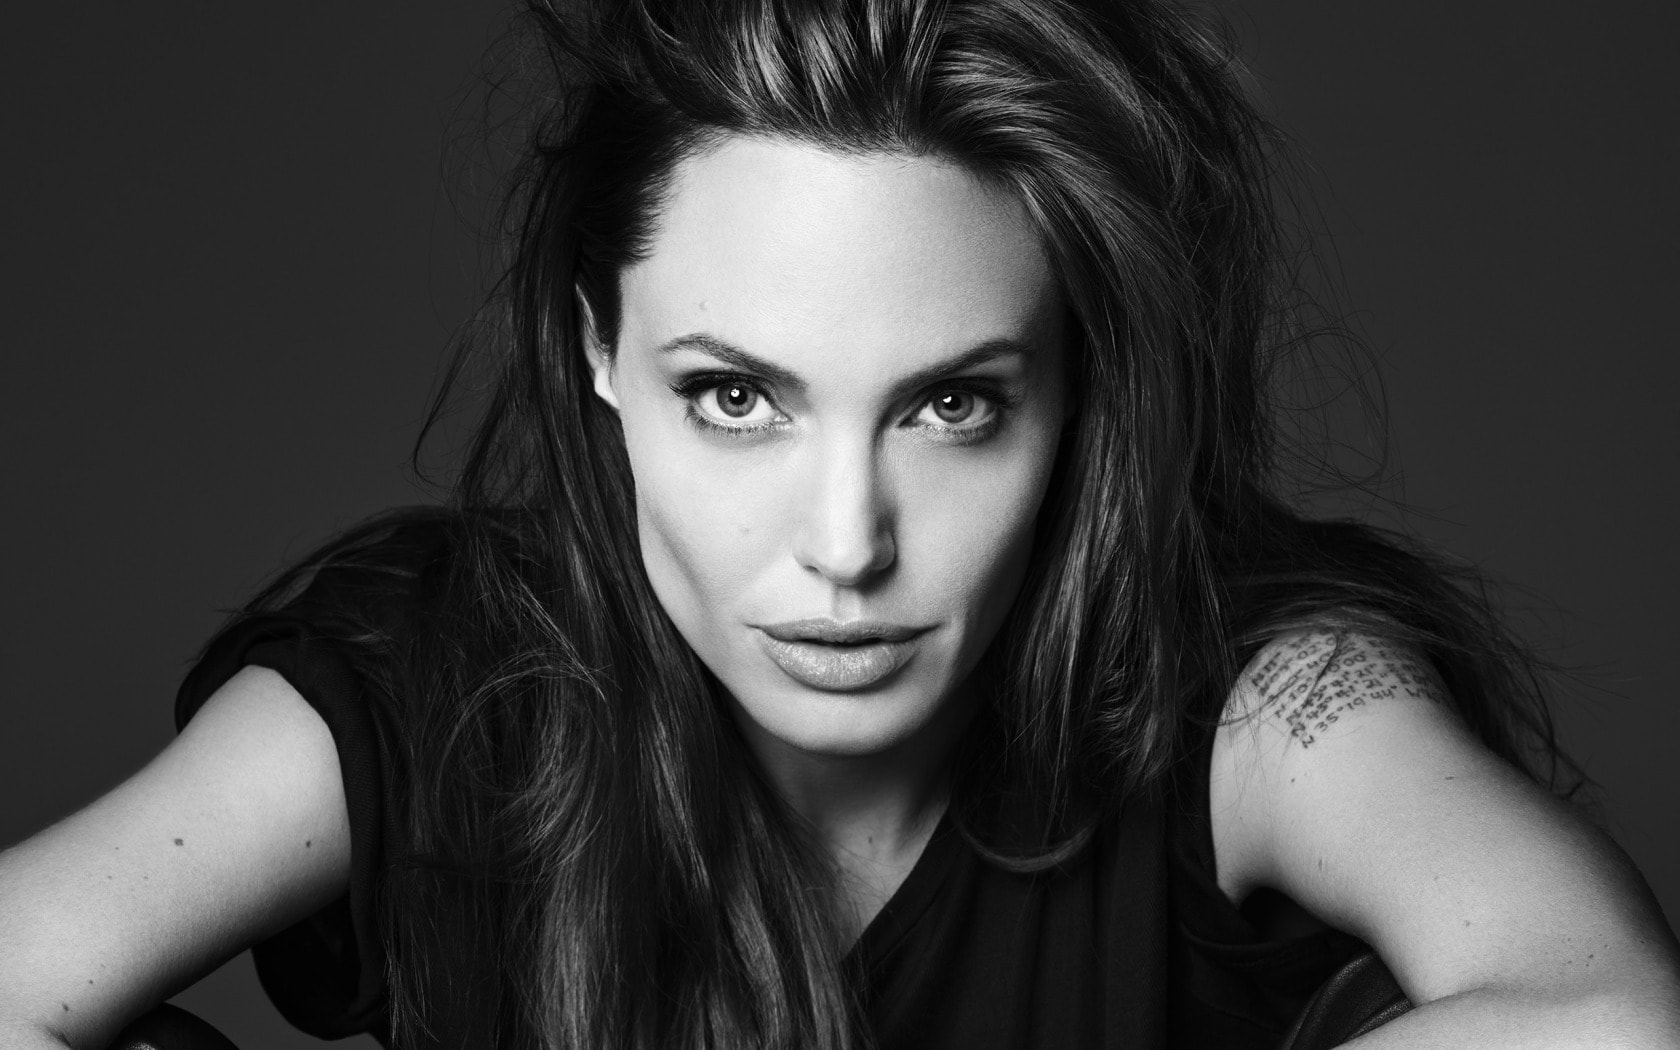 Angelina Jolie Free